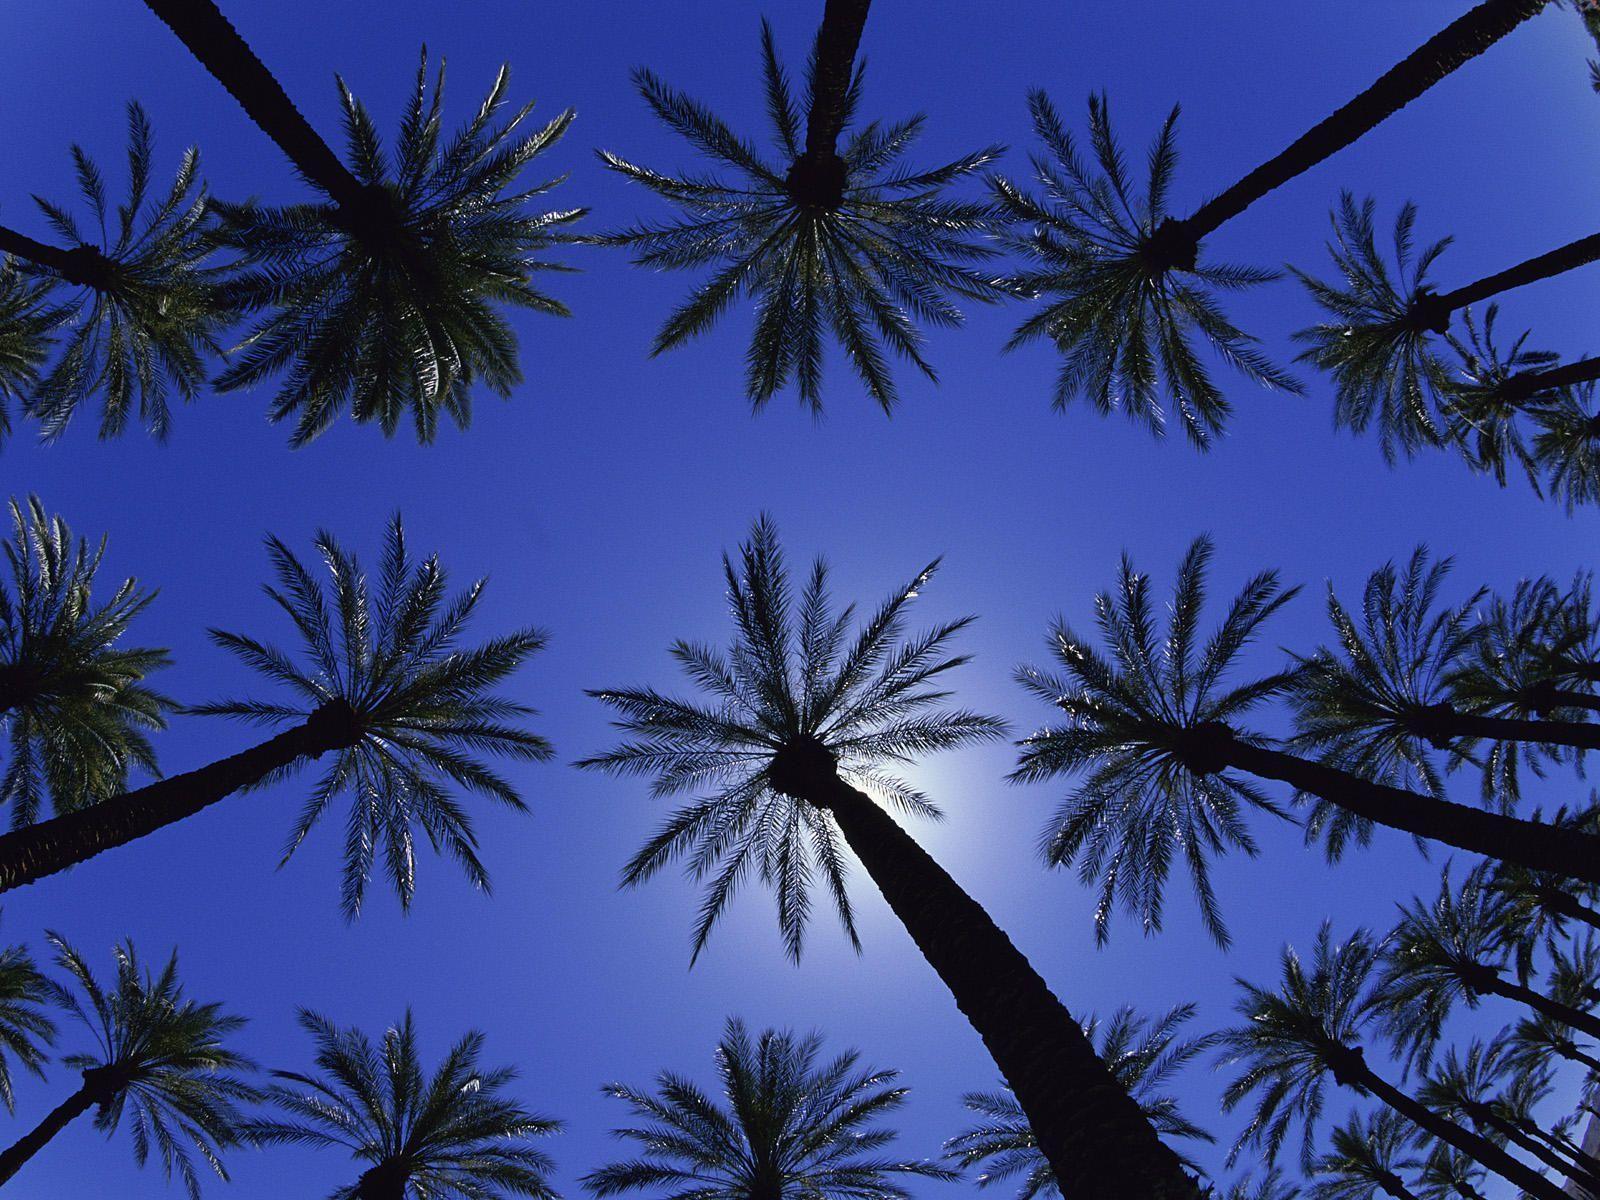 California Tumblr Photography Palm Trees Widescreen 2 HD